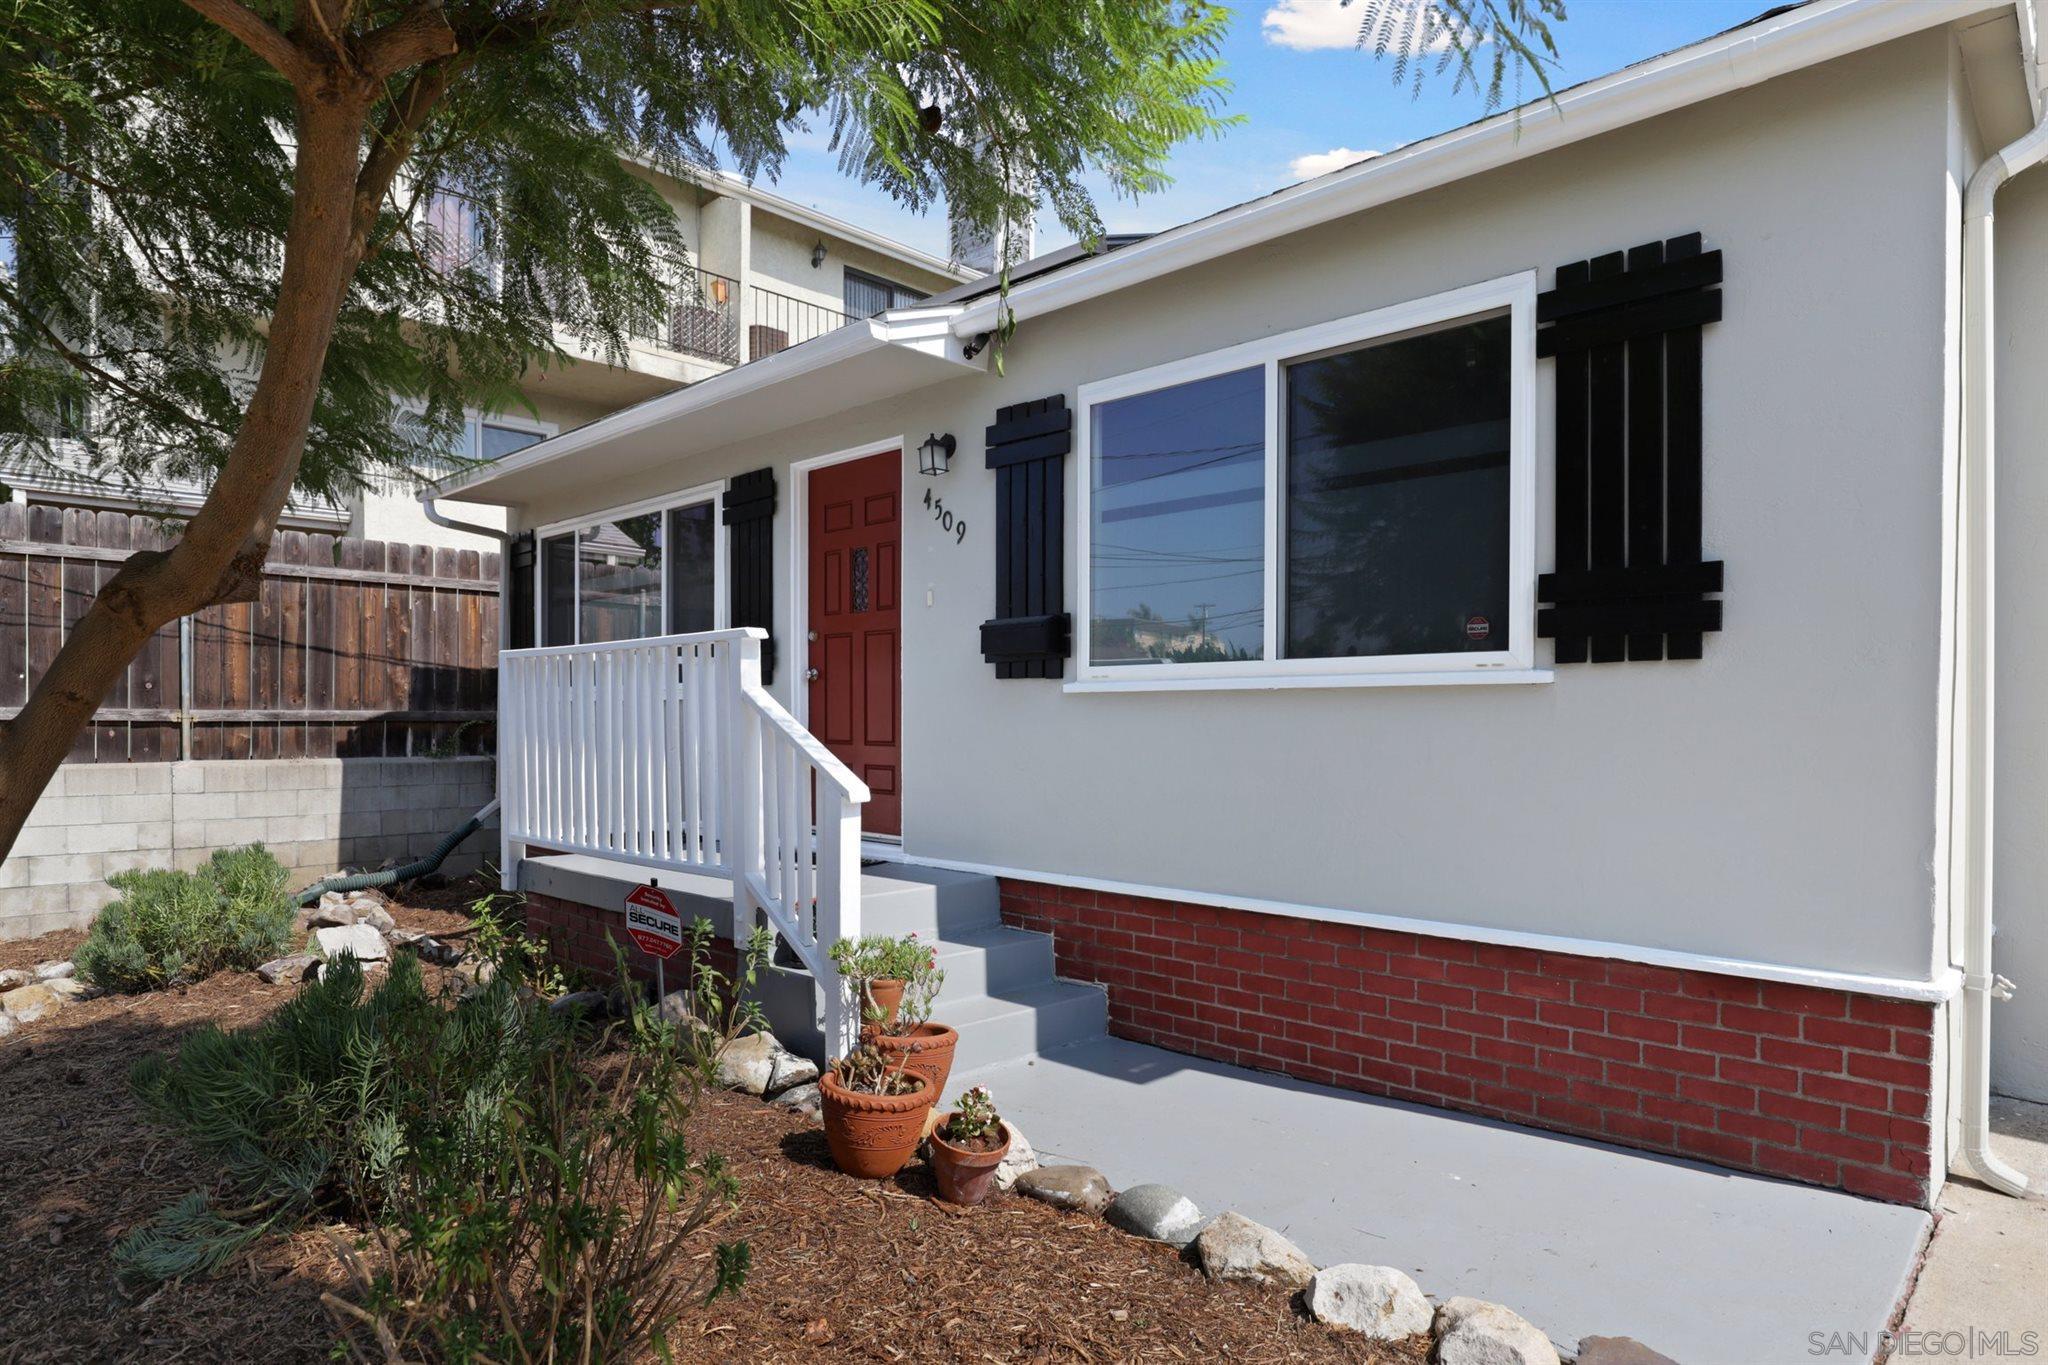 4509 College Way, San Diego CA 92115